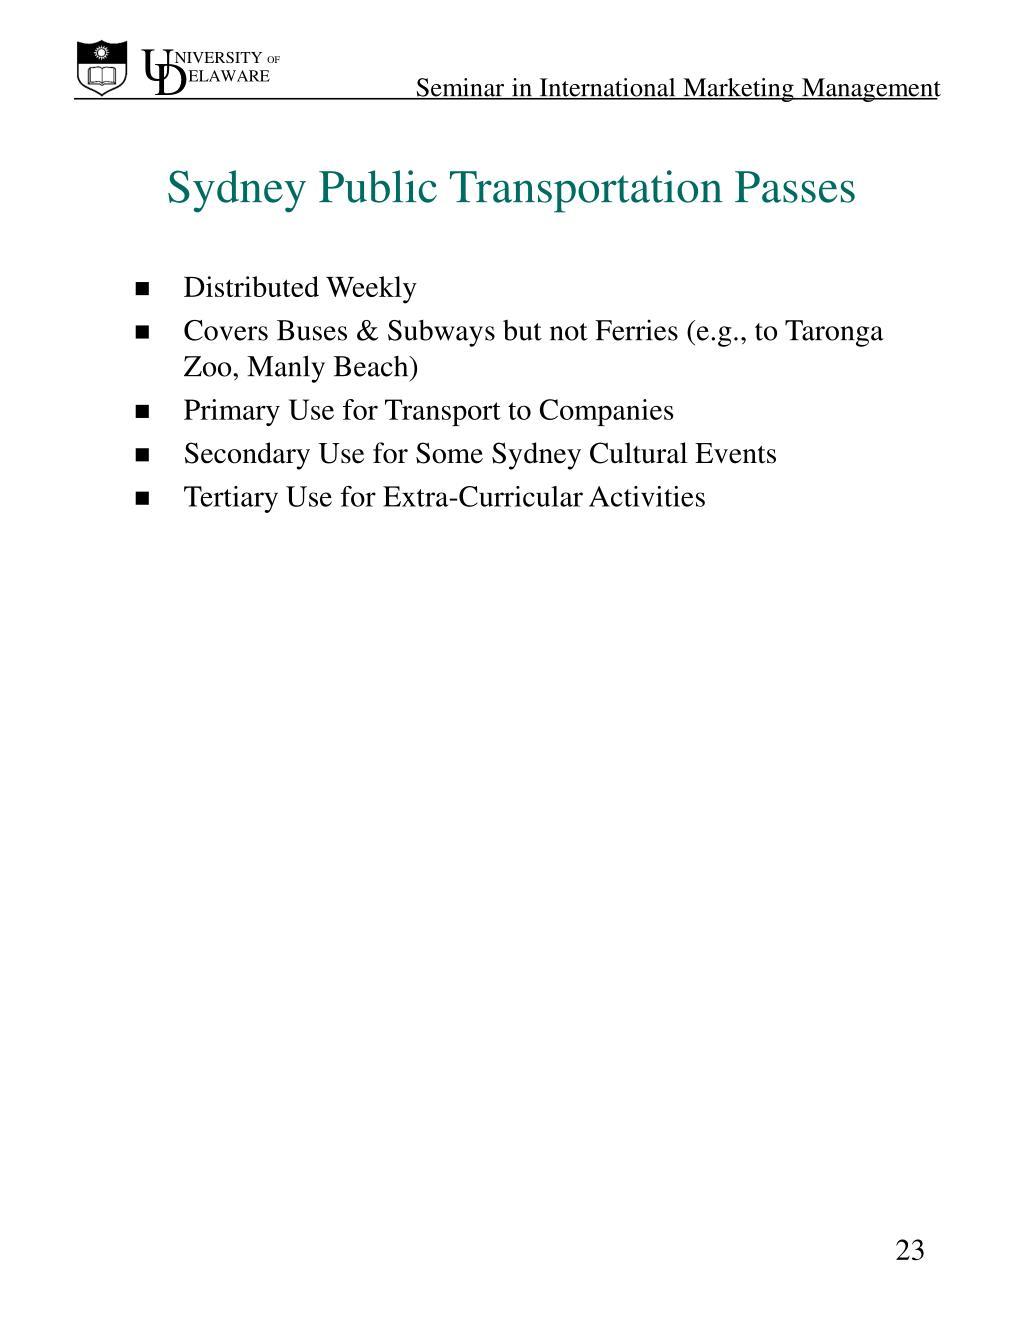 Sydney Public Transportation Passes